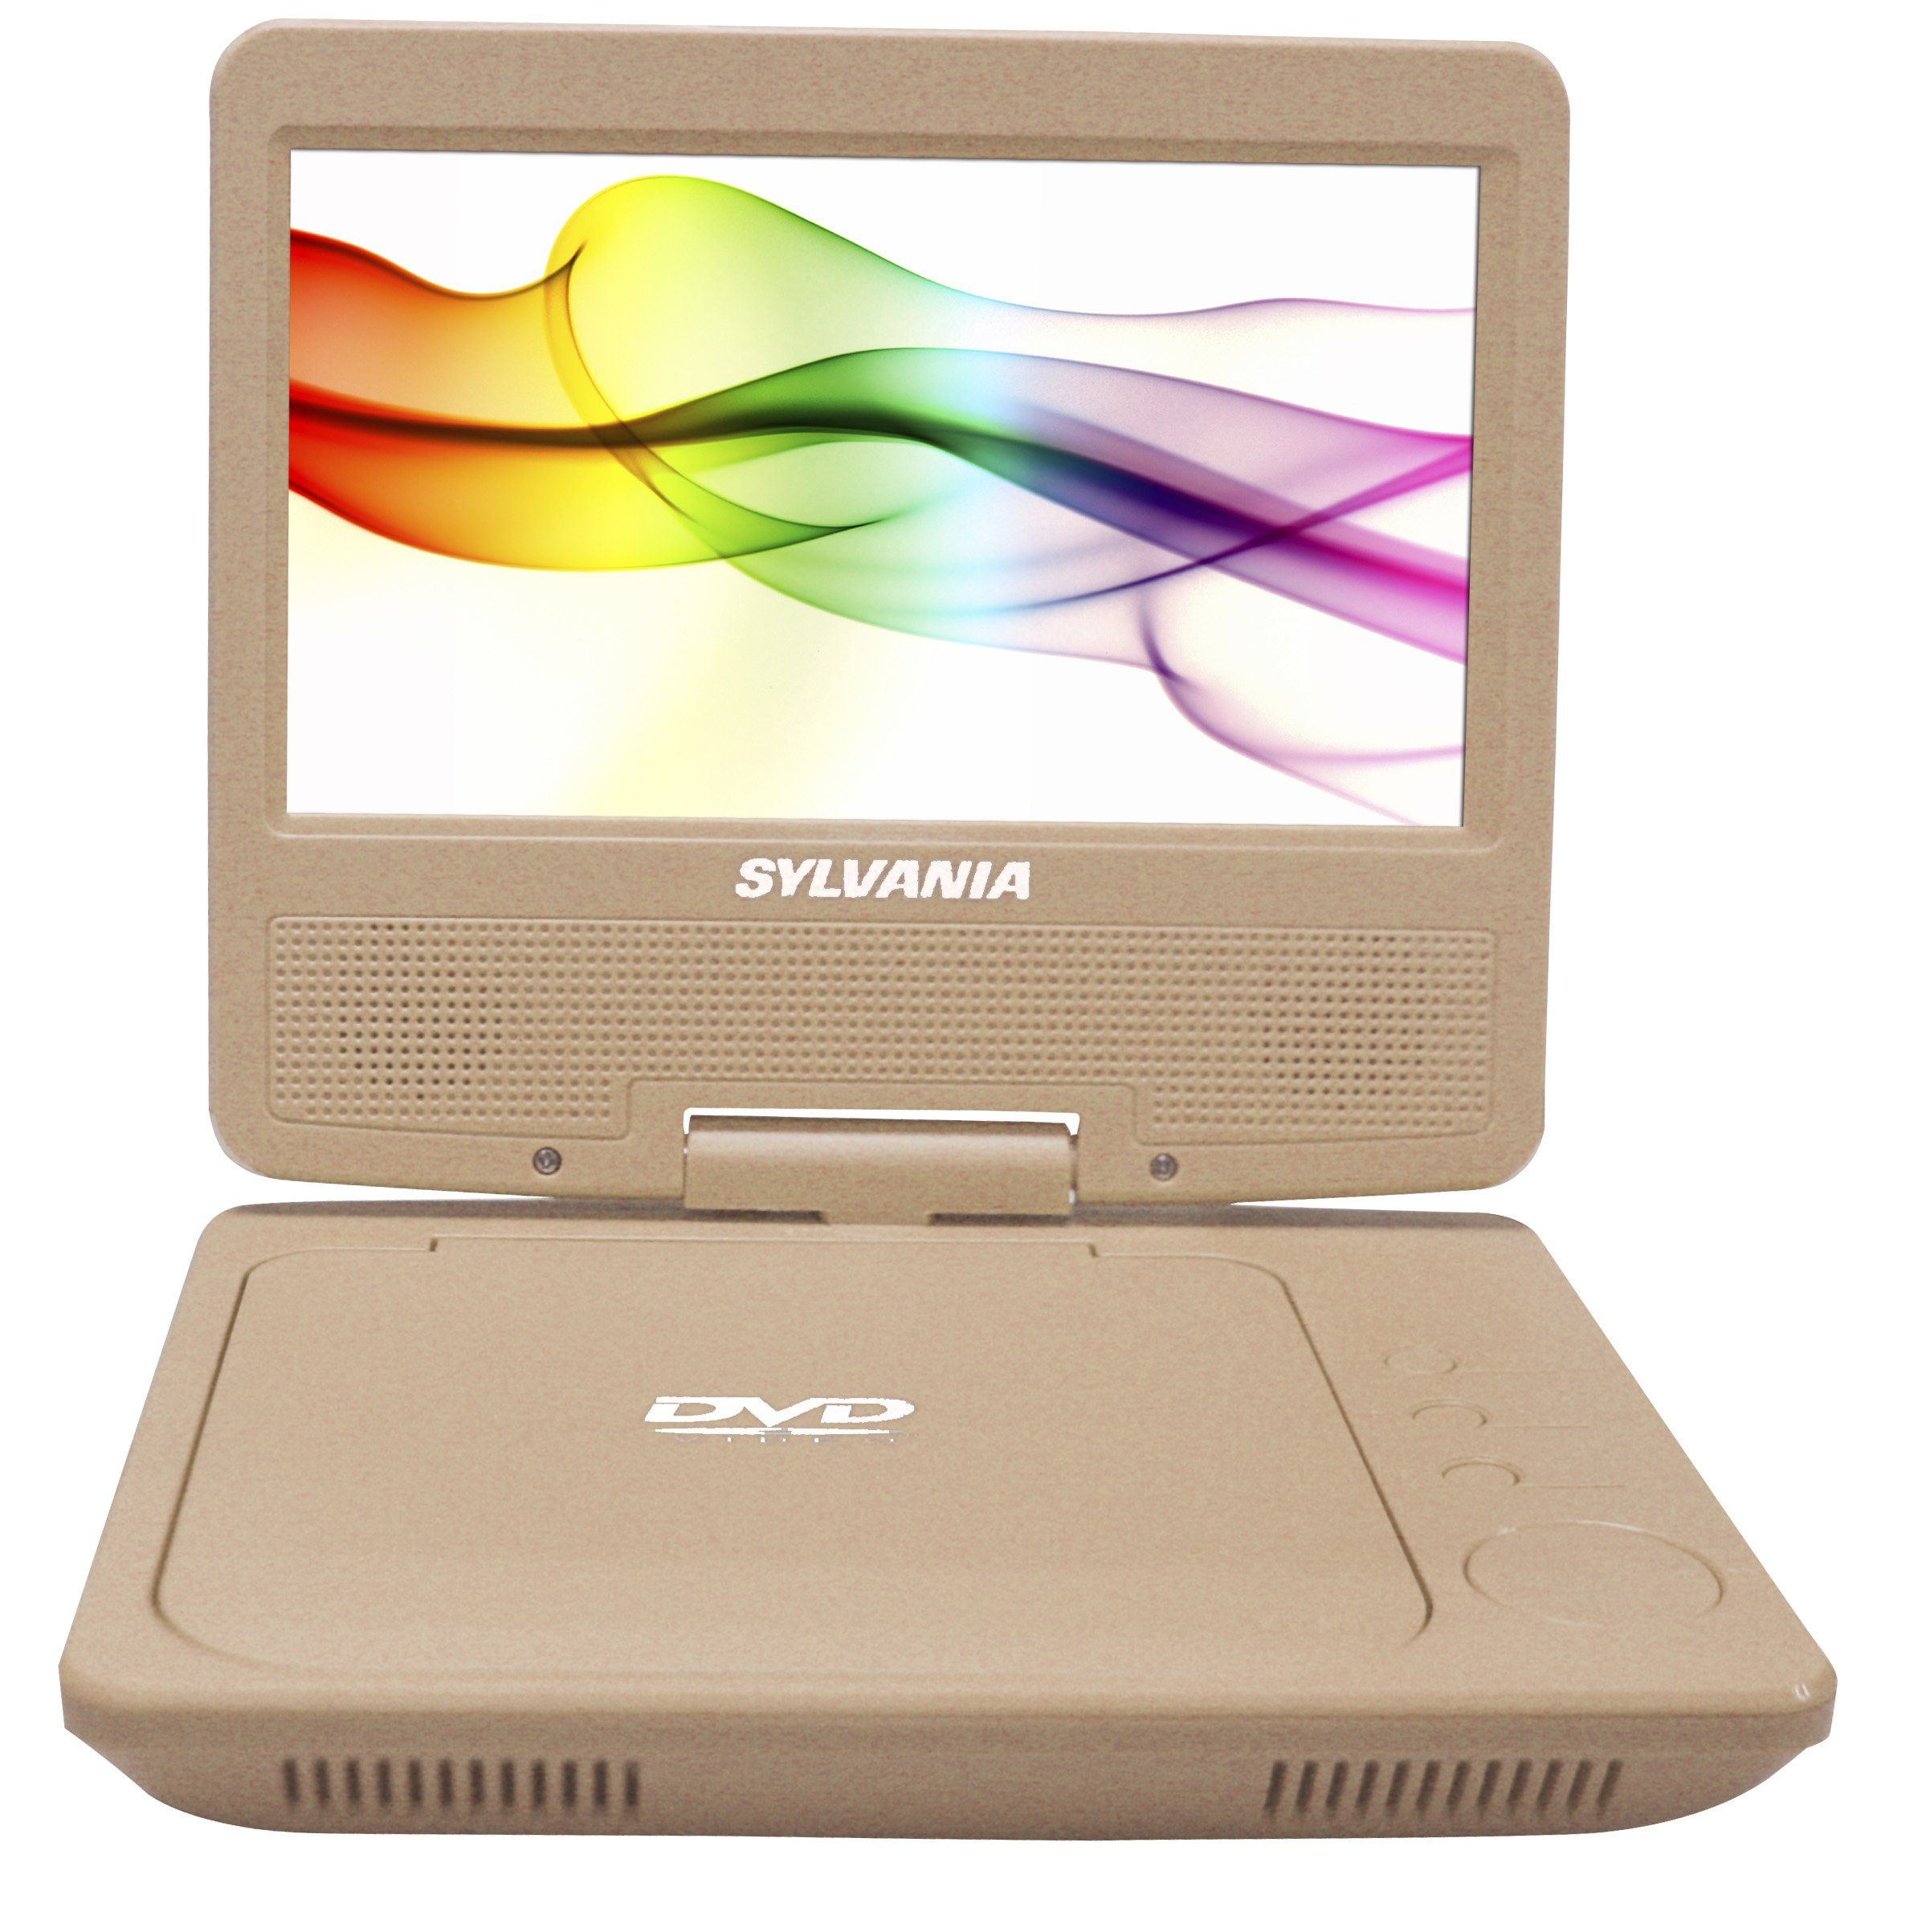 Sylvania Sdvd7027 C Gold 7 Quot Portable Dvd Player Swivel Screen Gold Portable Dvd Player Dvd Player Dvd